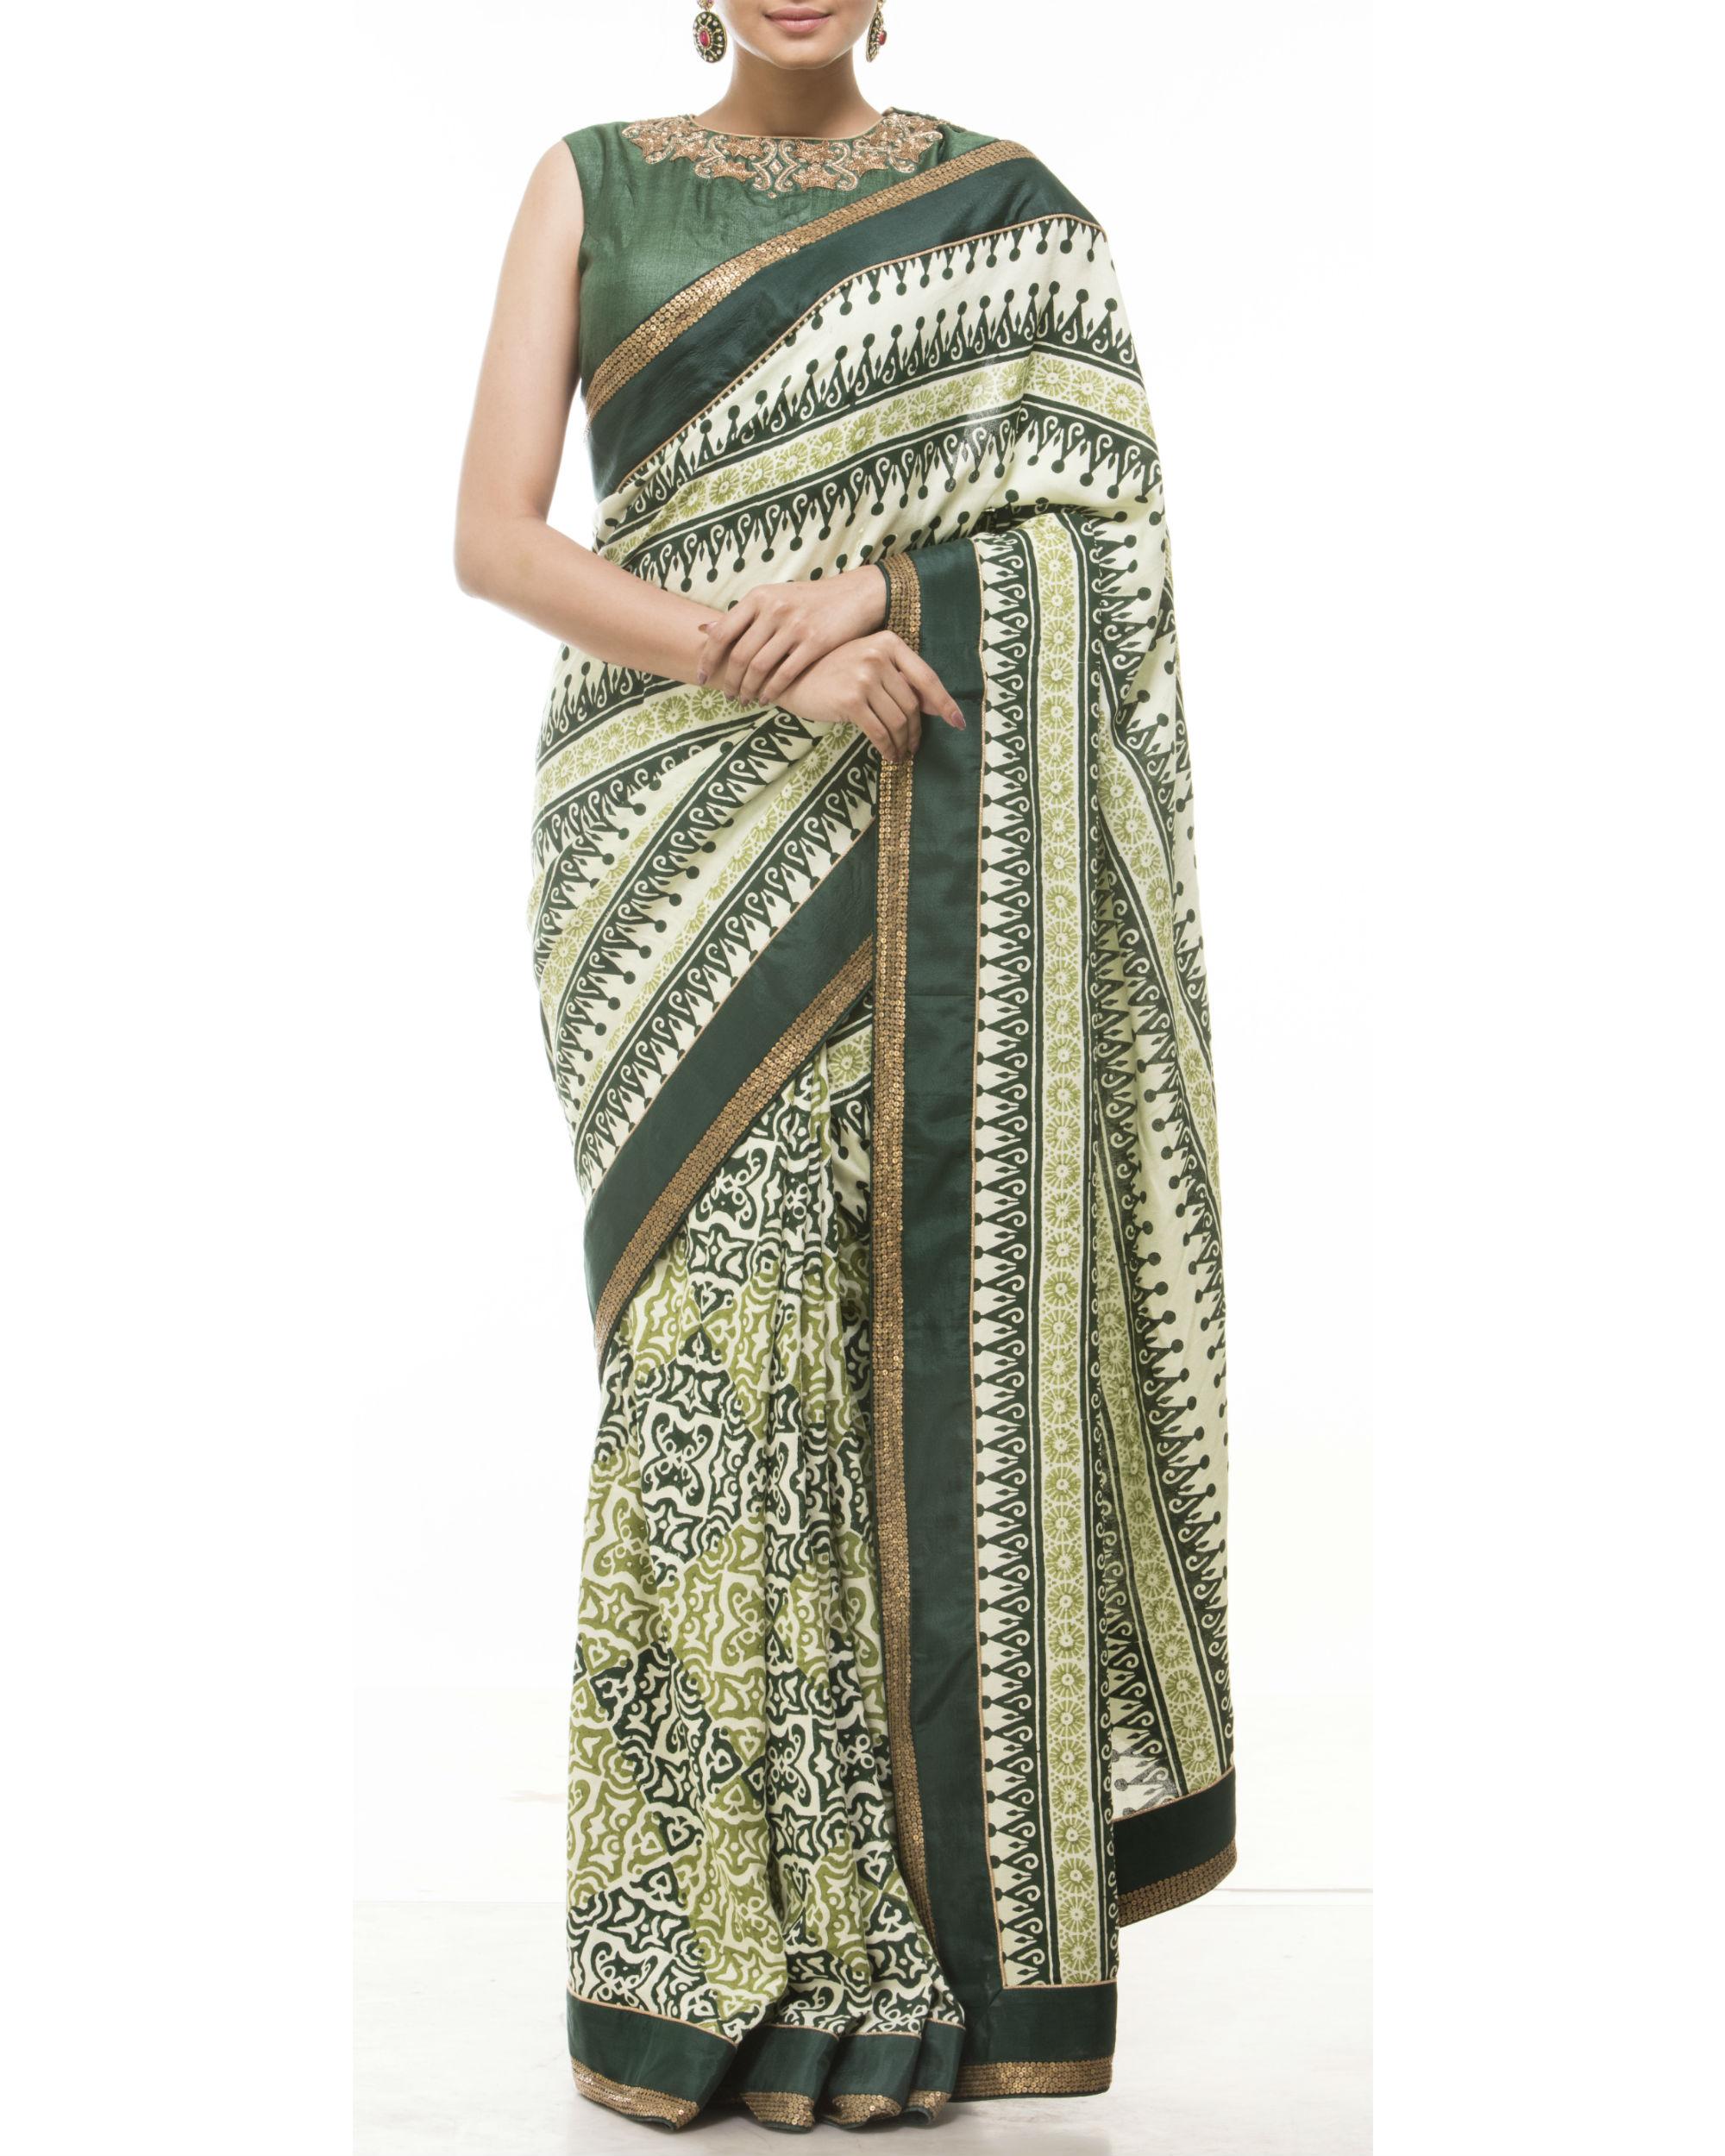 Green hand blocked printed sari